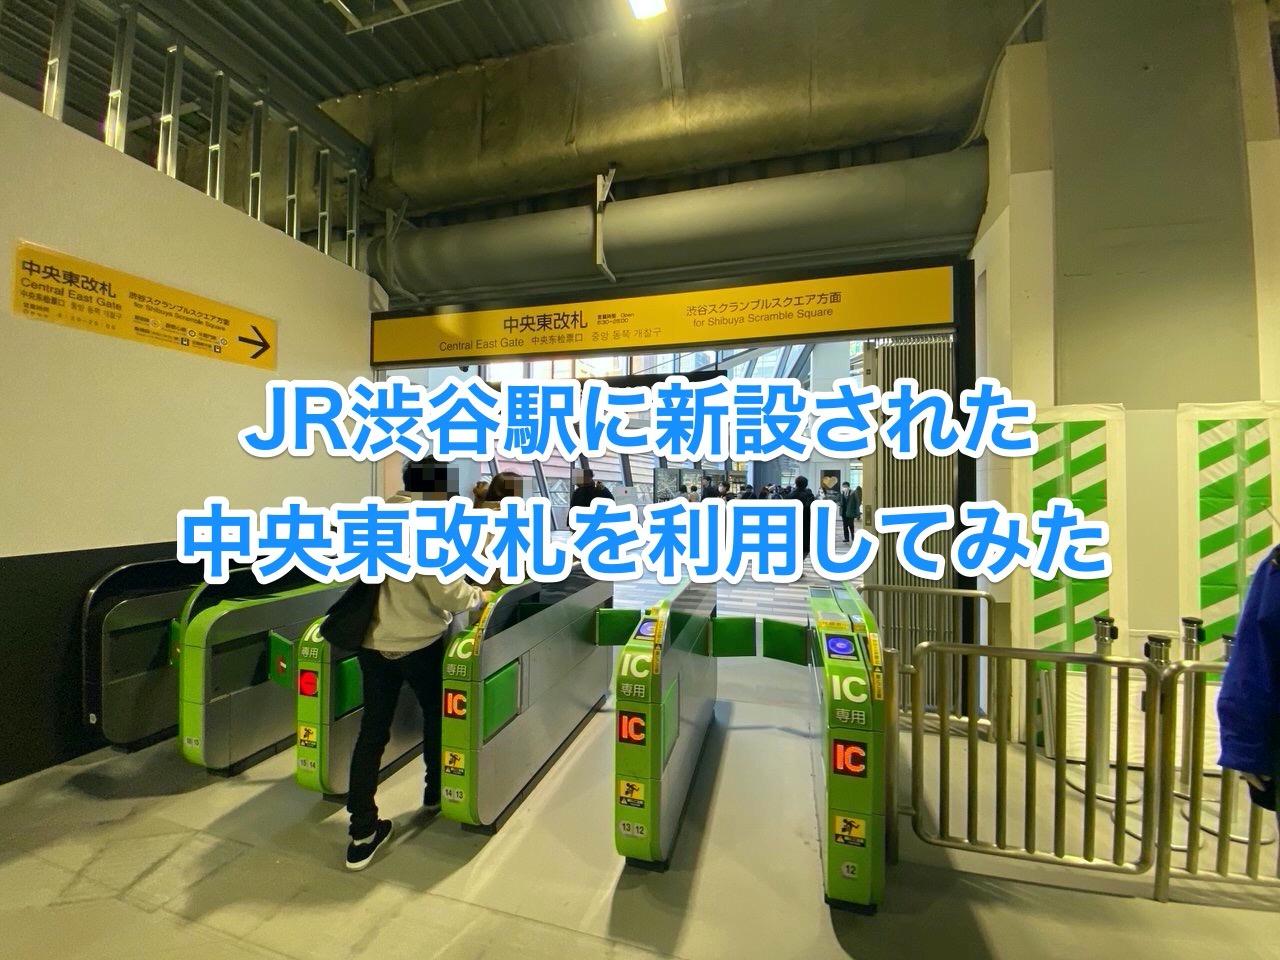 JR渋谷駅に新設された中央東改札を利用してみた